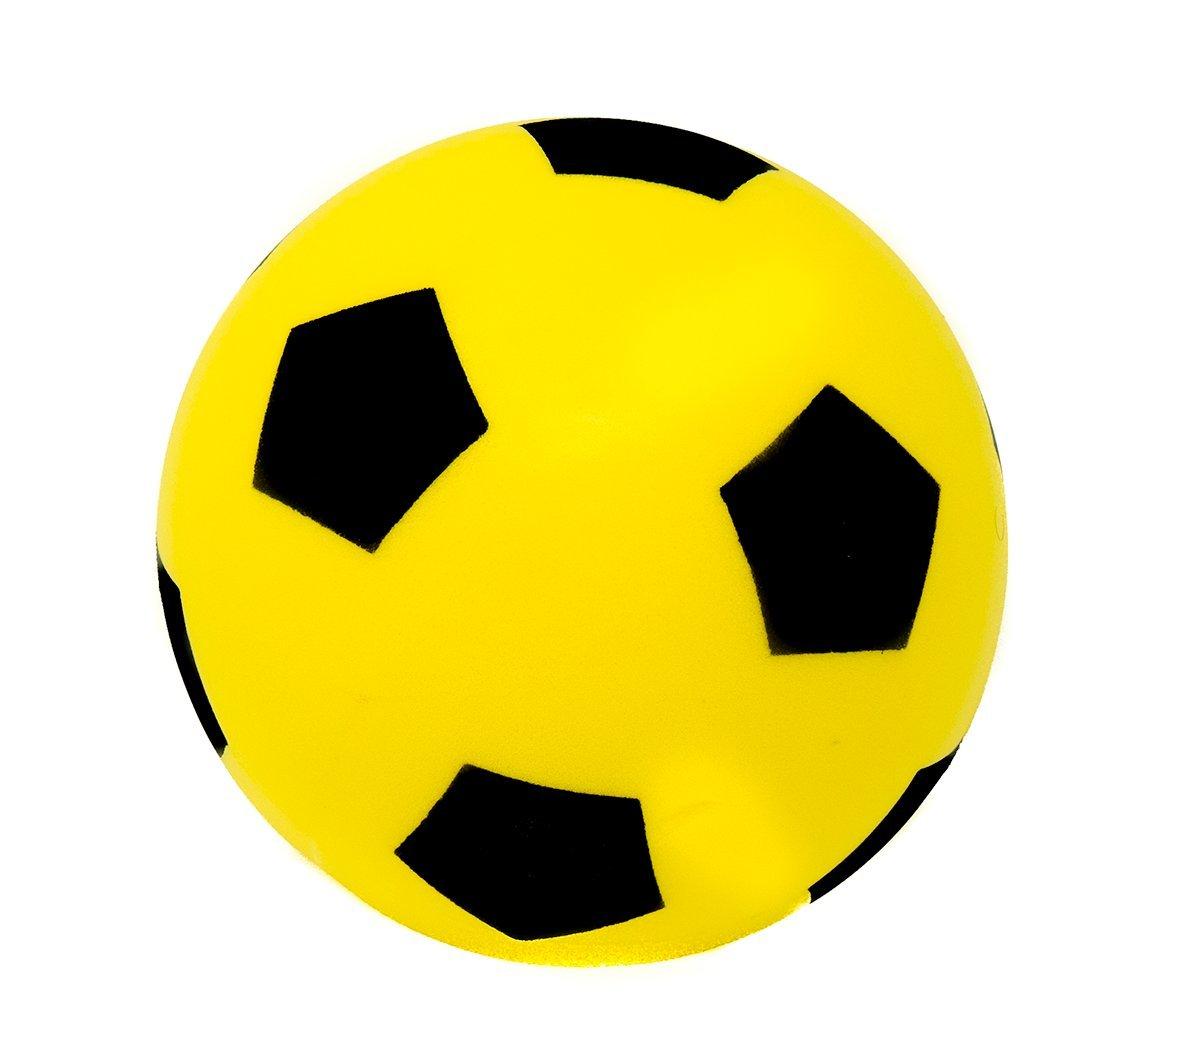 17,5 cm Color Amarillo E-Deals Bal/ón de f/útbol de Espuma Suave